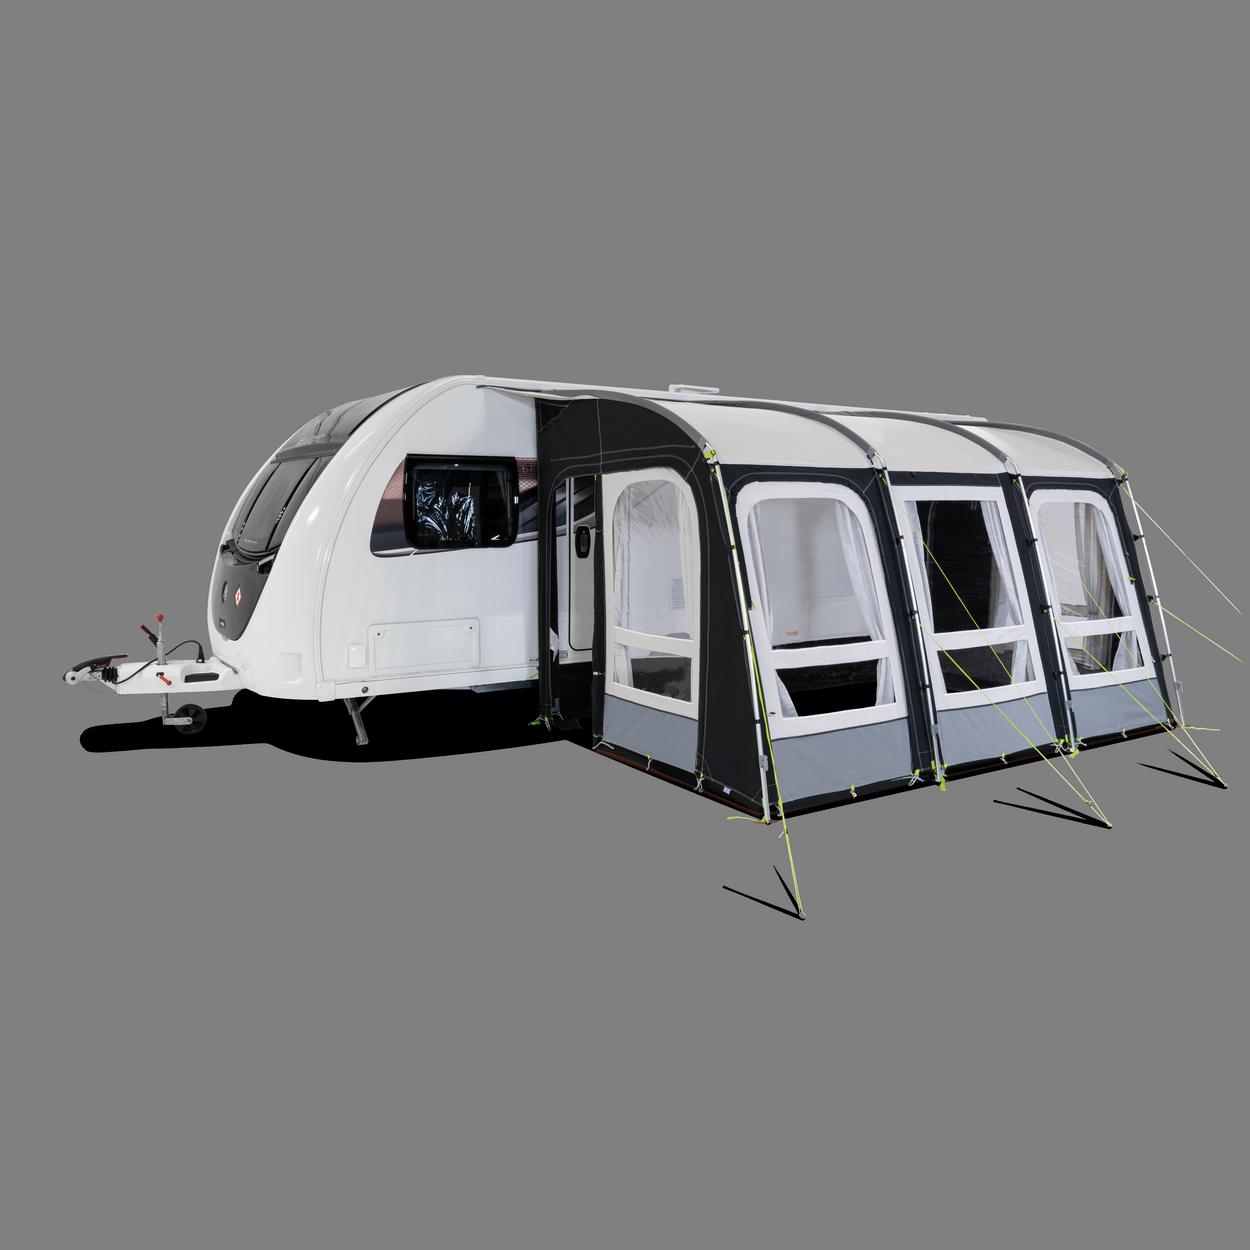 Kampa Dometic Rally Pro 390 Norwich Camping Aw0008